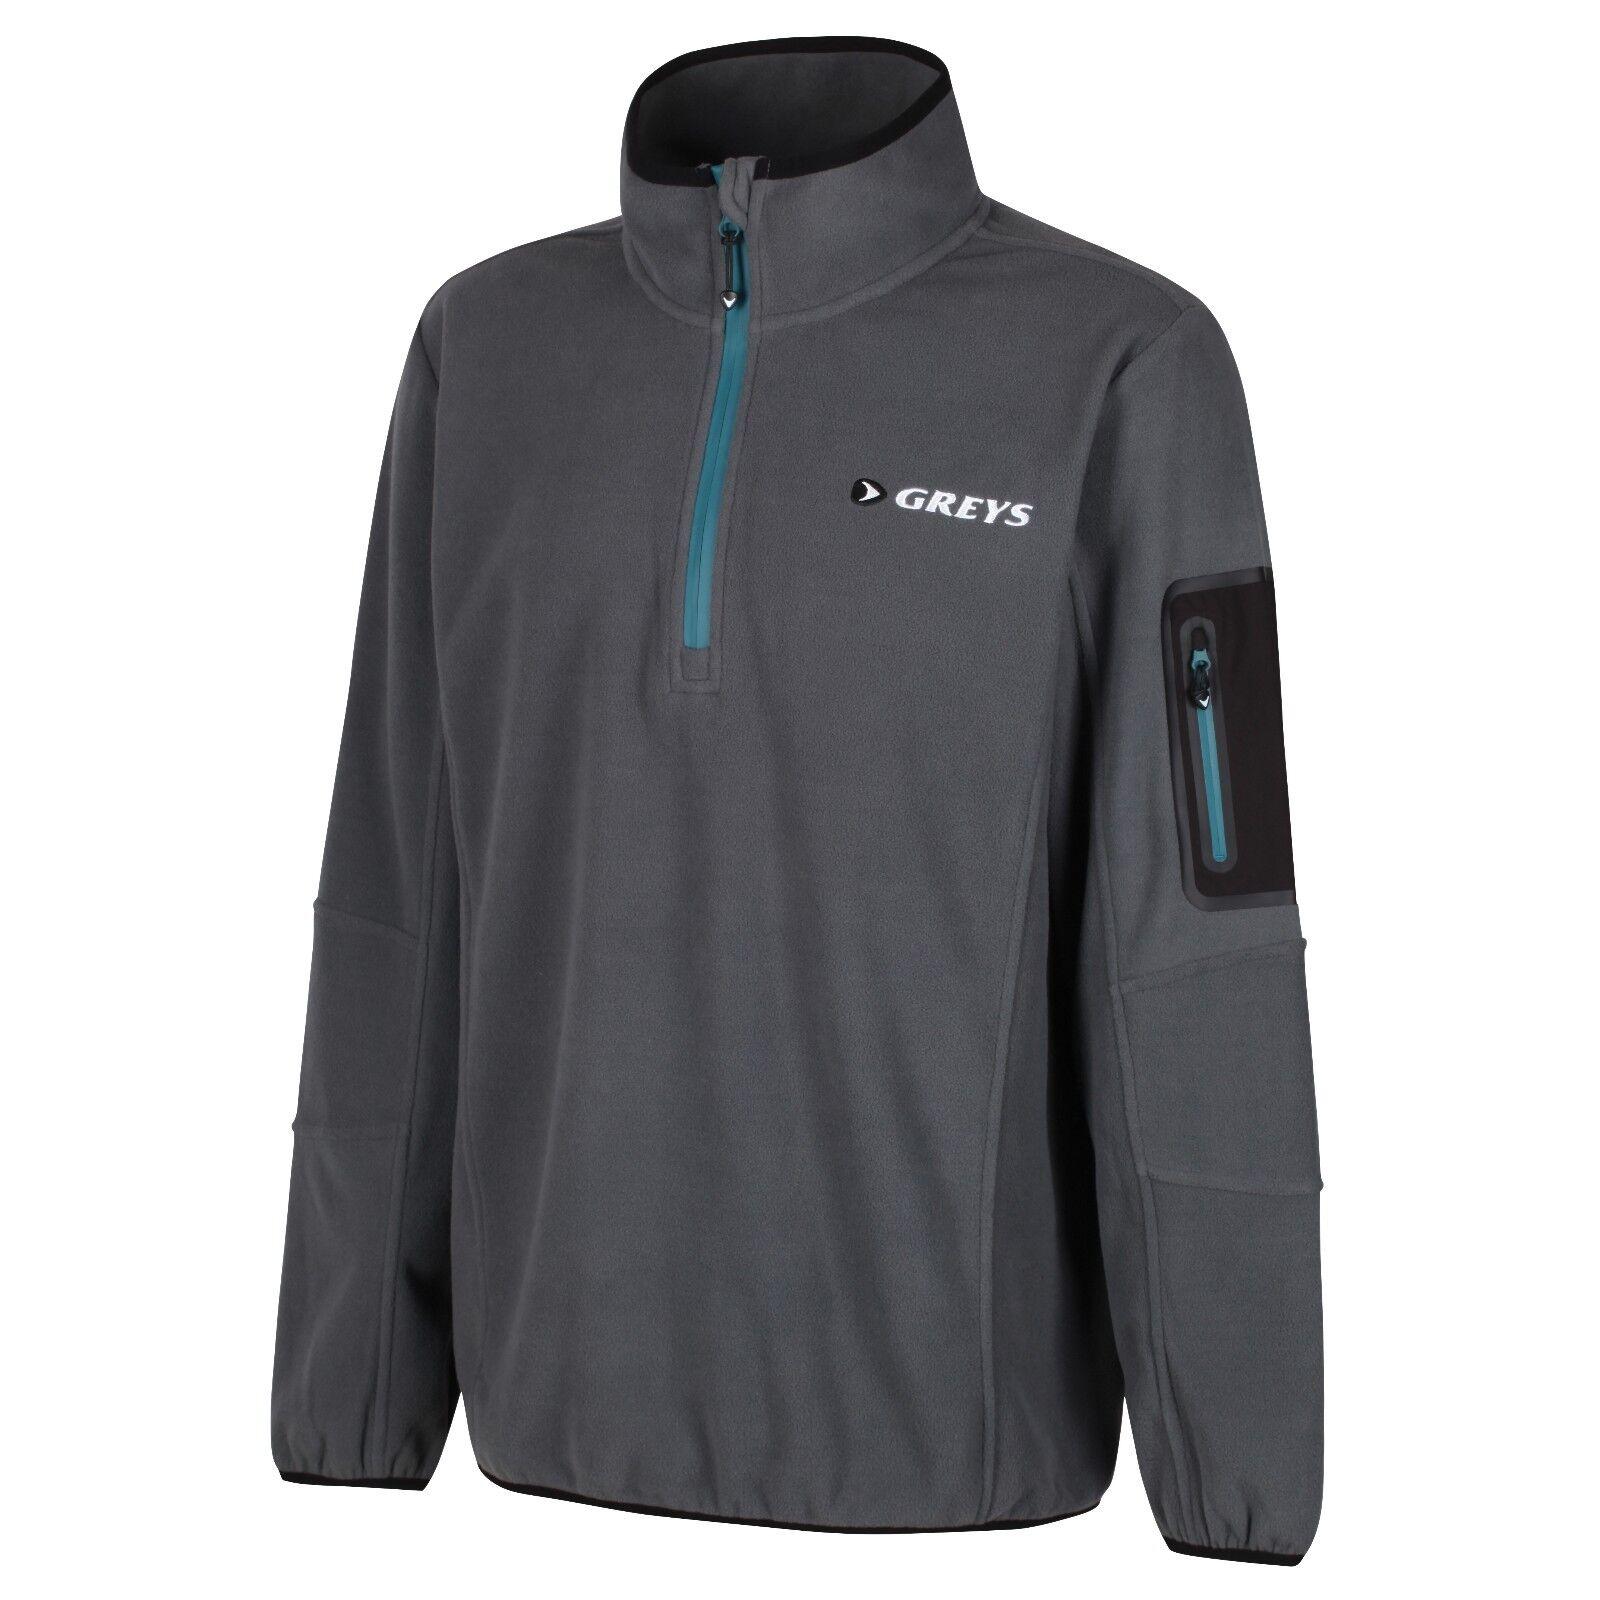 griss nuevo micro Fleece pescar chaqueta opaca viento firmemente transpirable